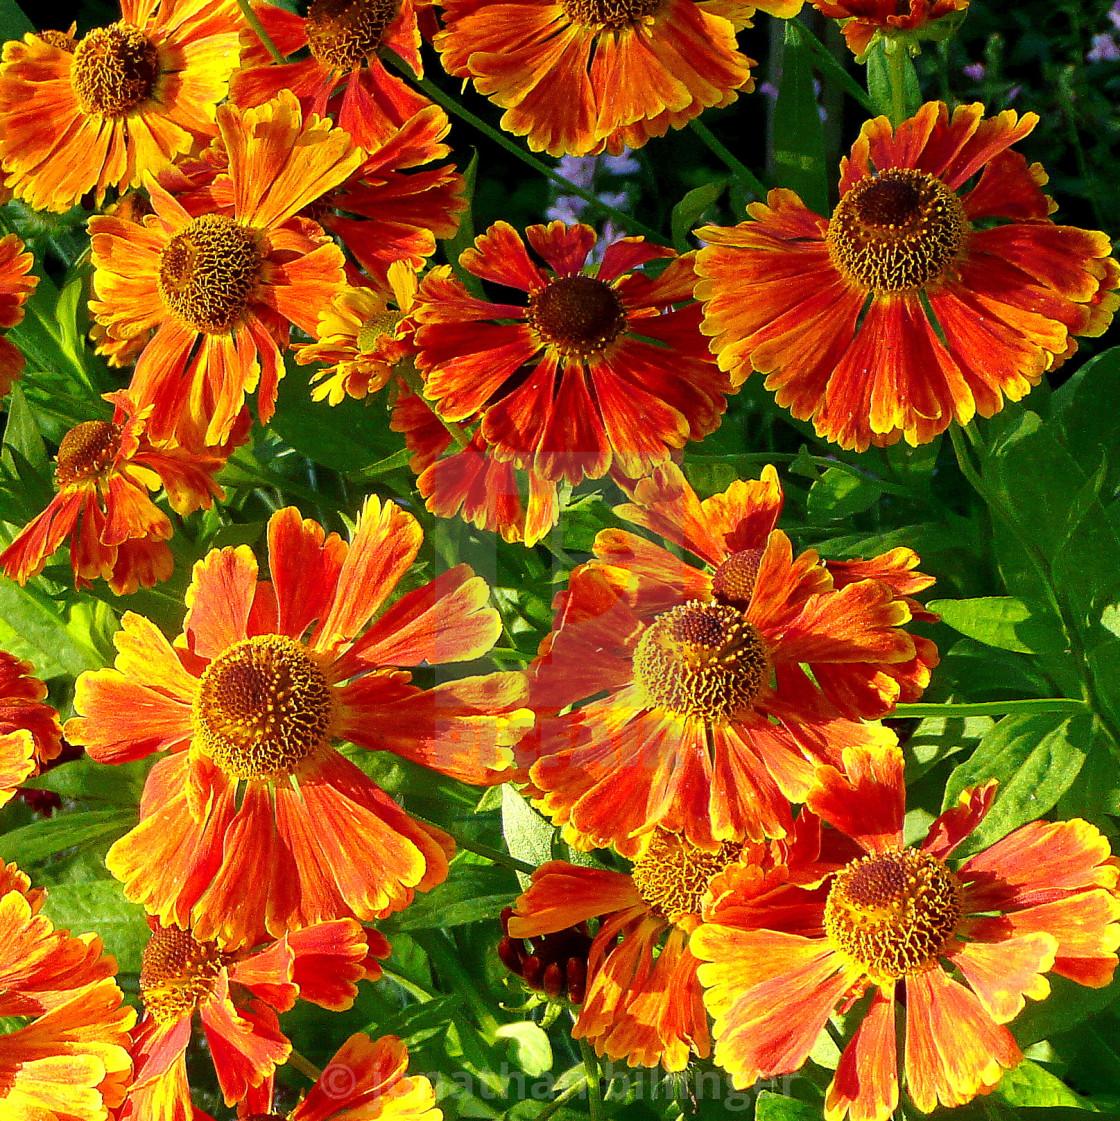 """Helenium autumnale 'Moerheim Beauty', 1"" stock image"